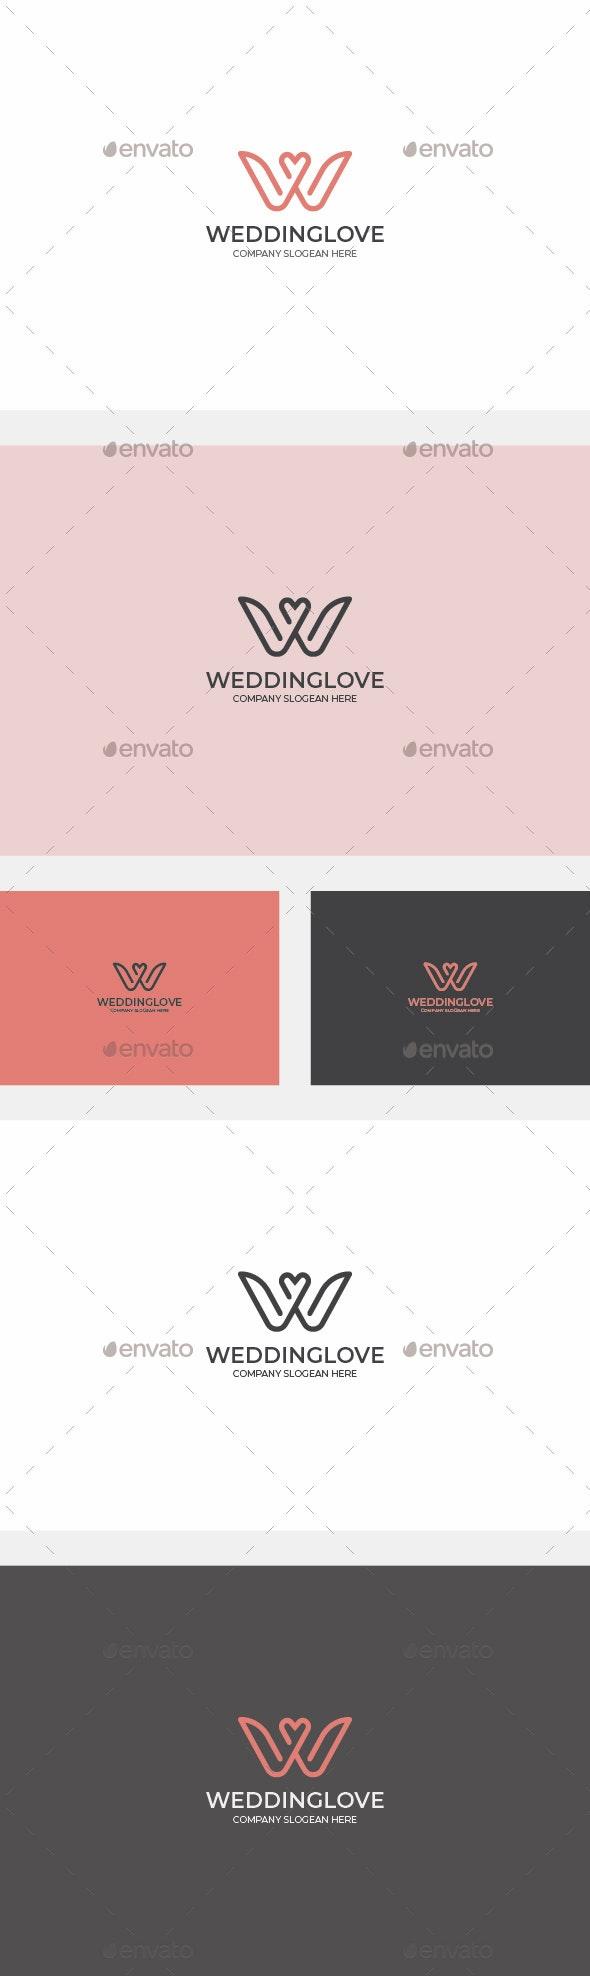 Wedding Love - Letter W Logo - Letters Logo Templates